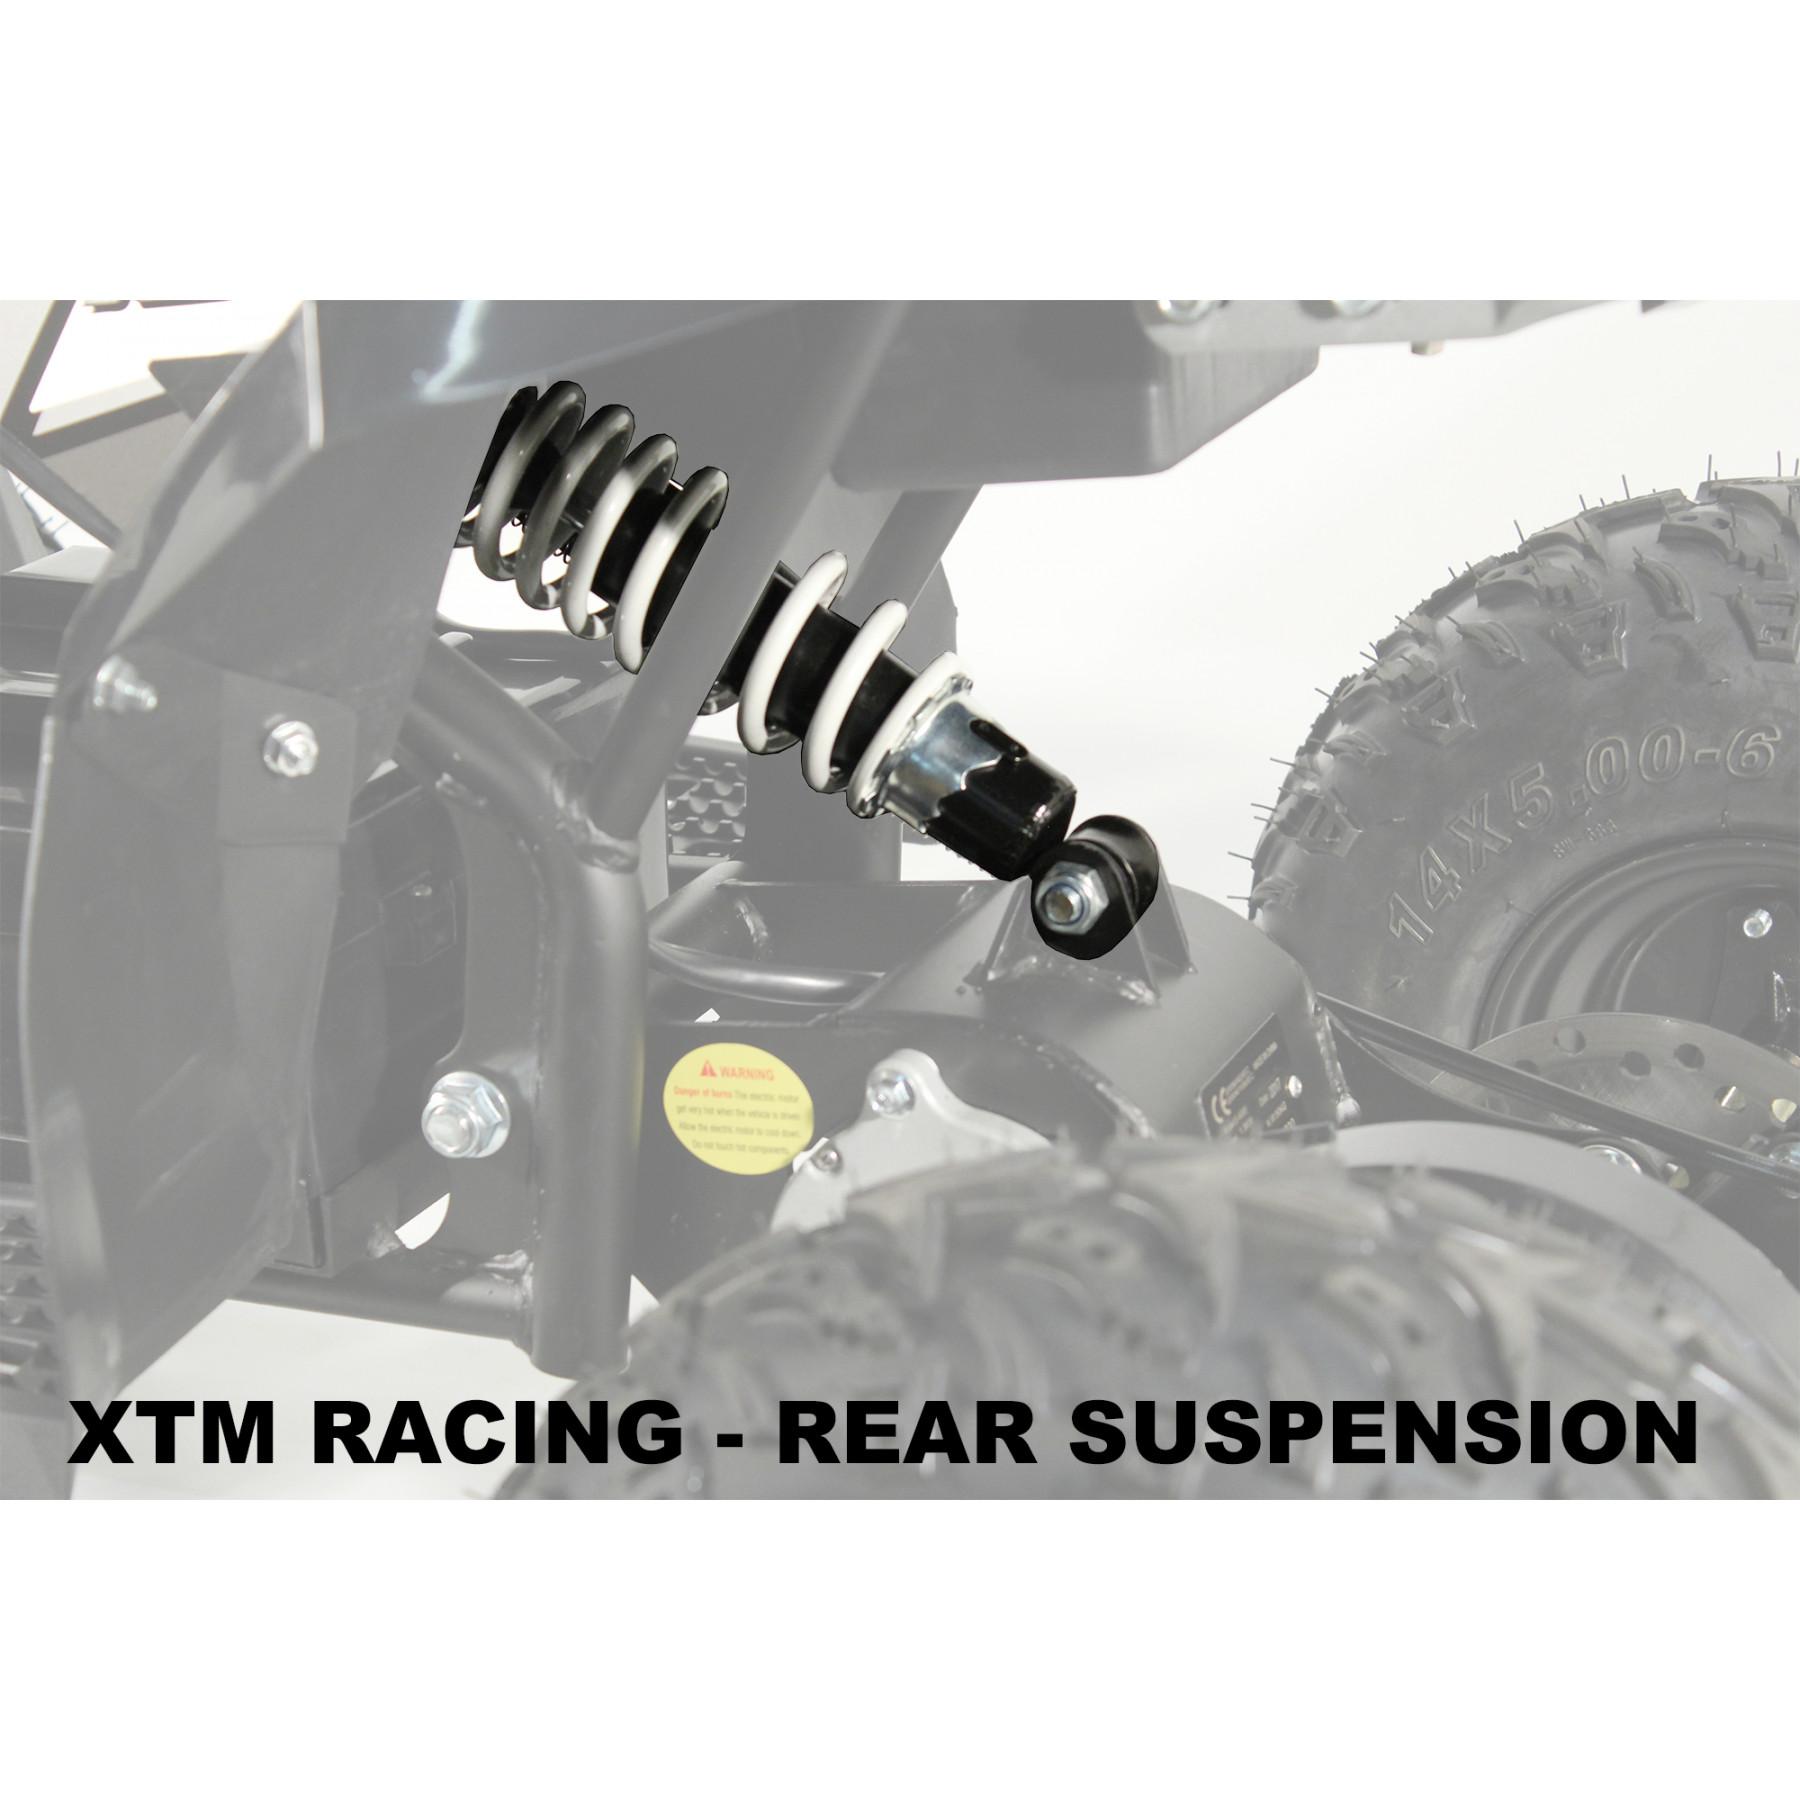 XTM RACING QUAD COMPLETE REAR SUSPENSION